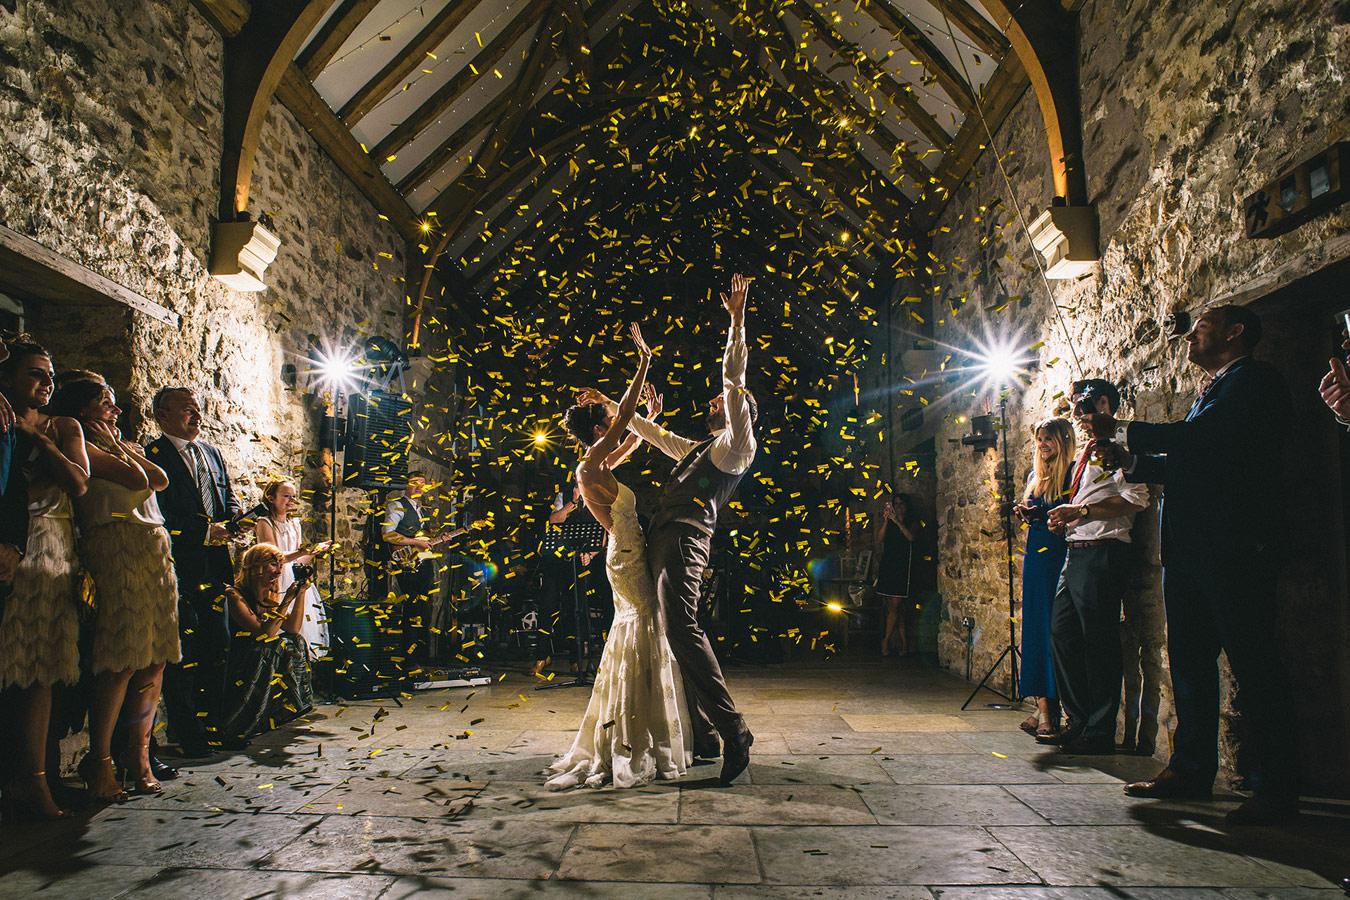 © Paulo Santos, Wallsend, Tyne & Wear, United Kingdom, 2st place in category Professional : Wedding Reception, Rangefinder Wedding Contest 2017 Winners